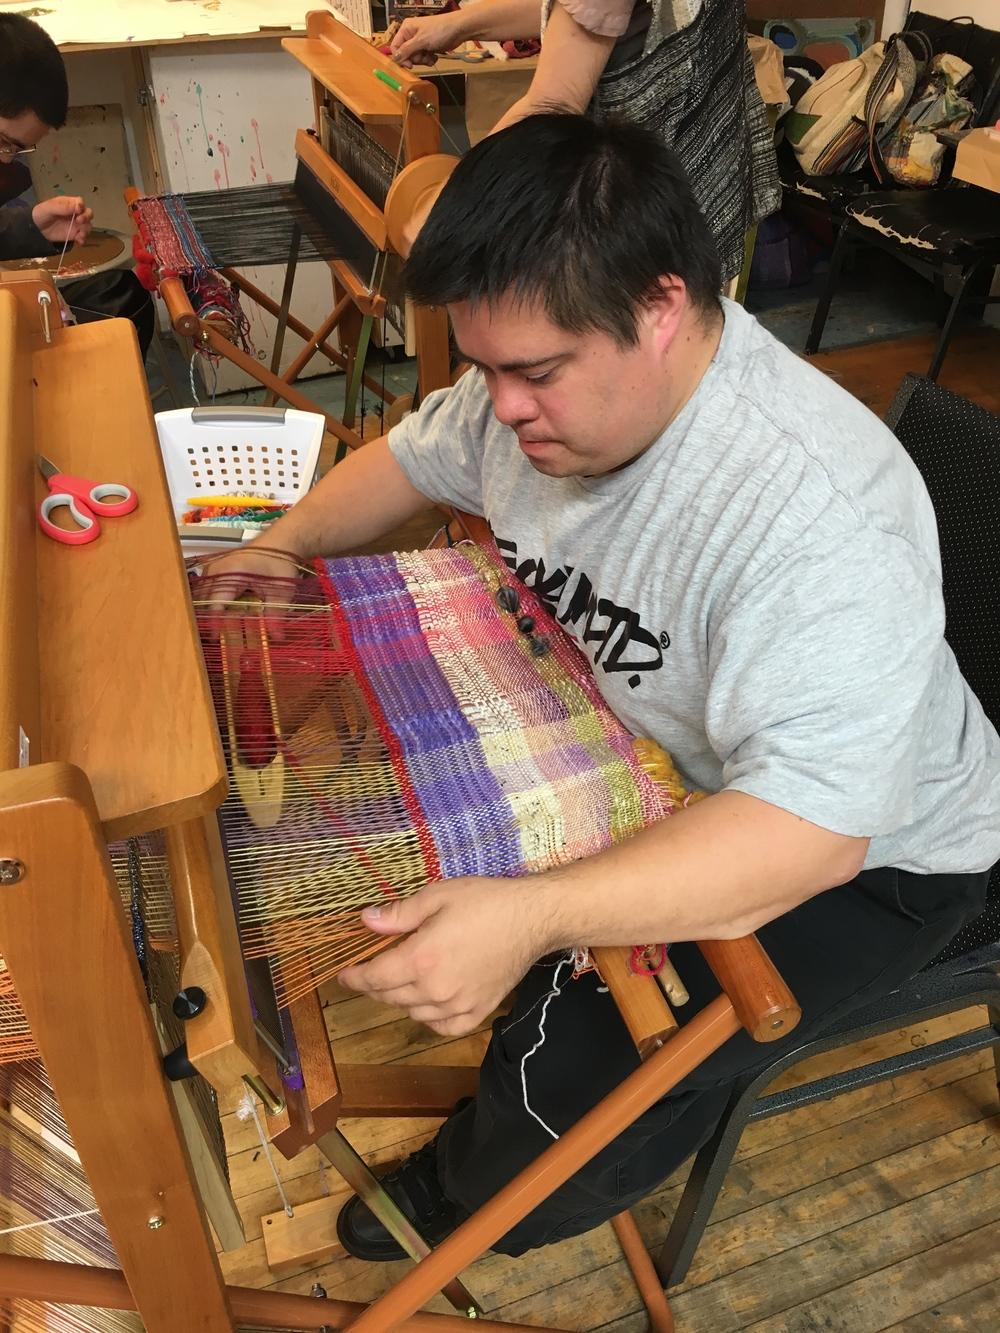 Artist Paul Pulizzano SAORI weaving